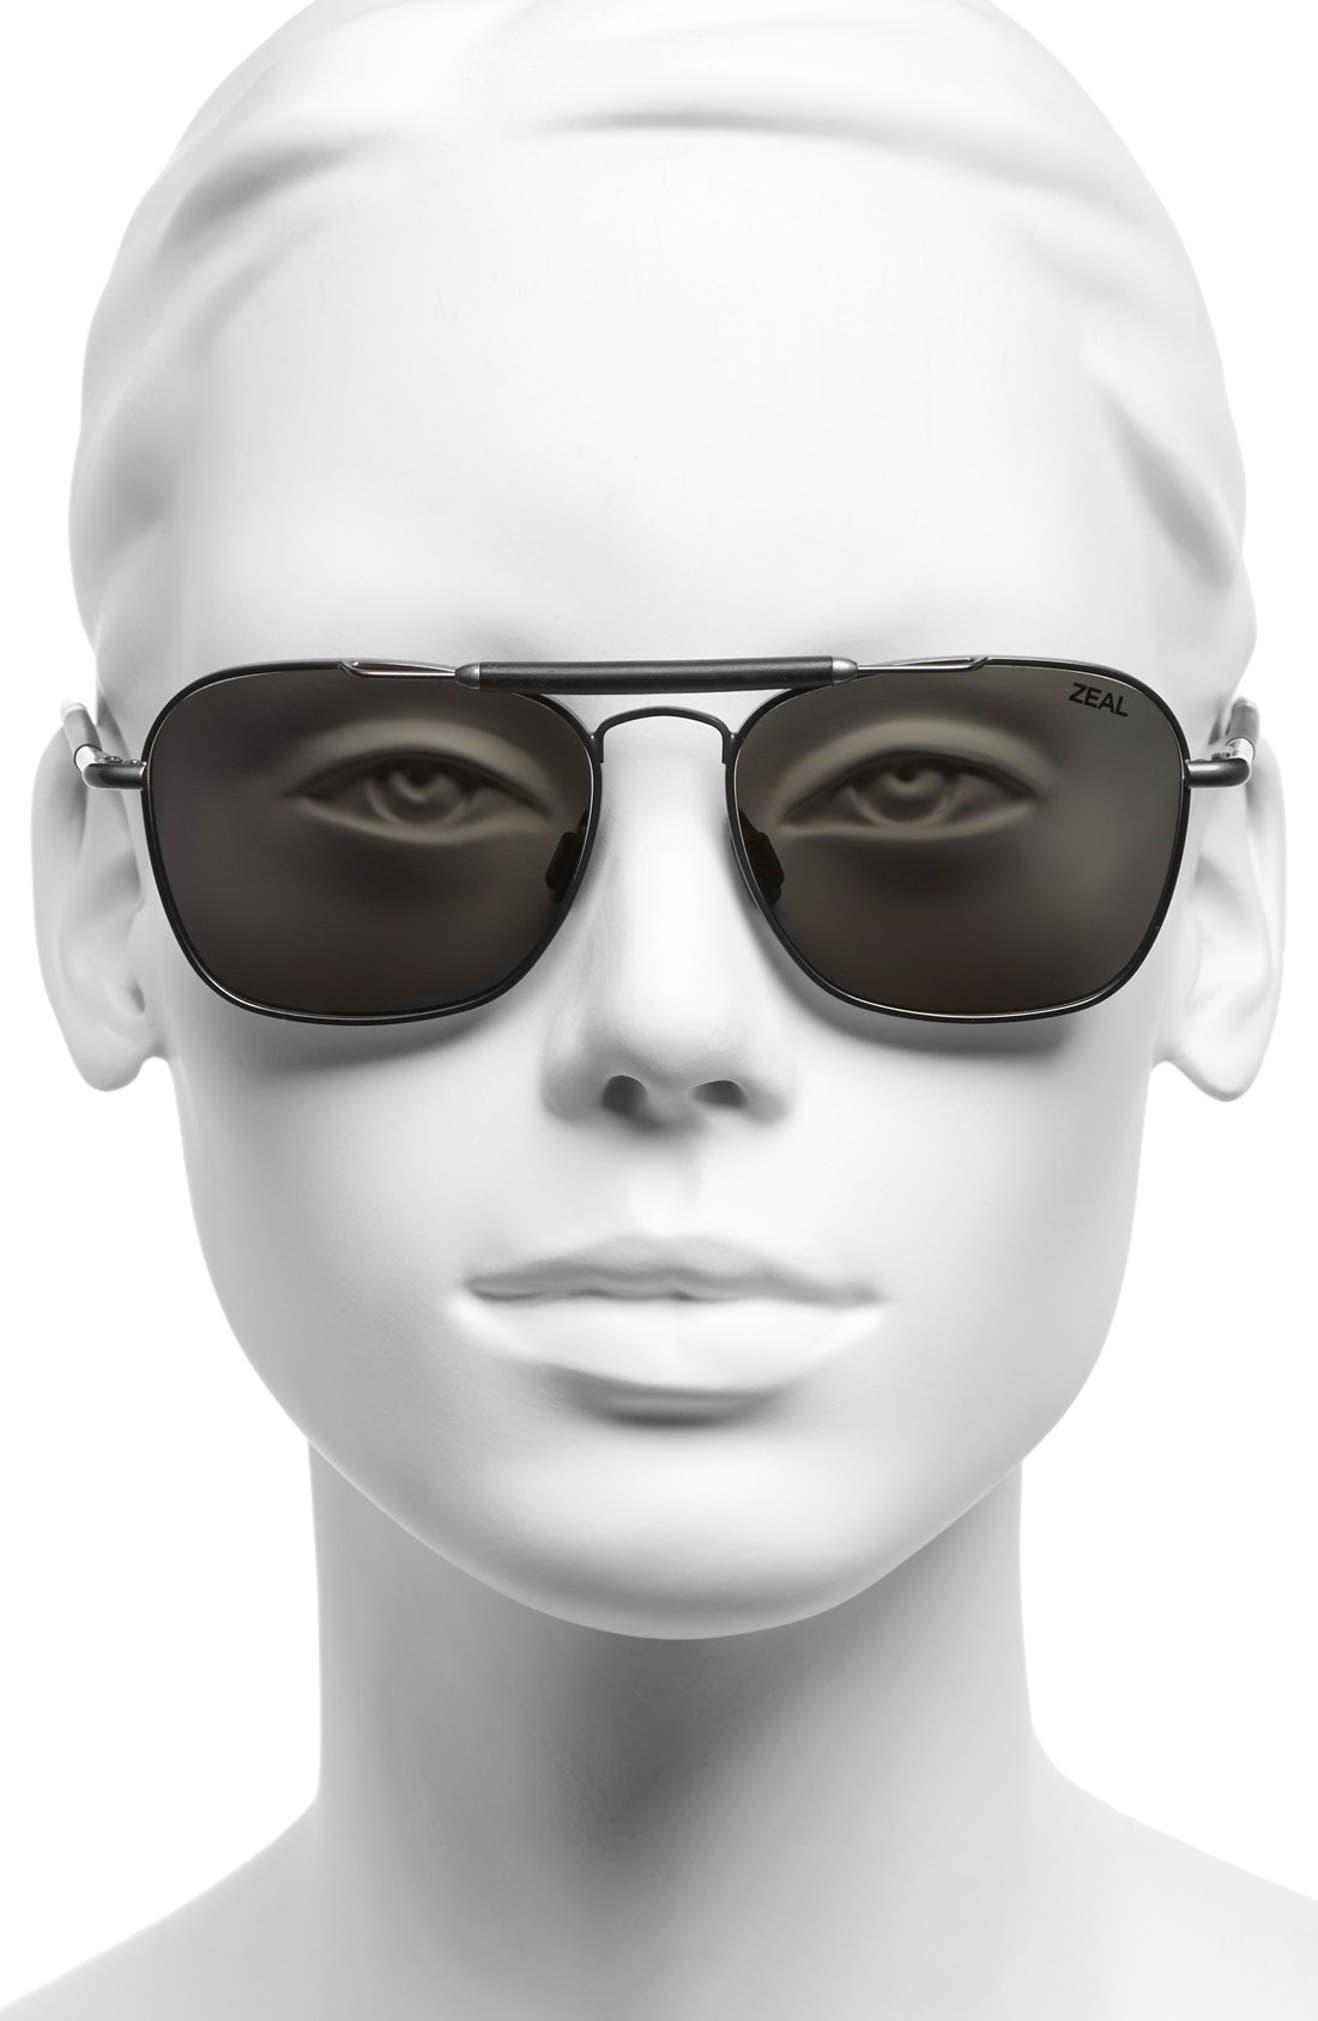 57ba65494f Zeal Optics  Draper  55mm Polarized Plant Based Sunglasses